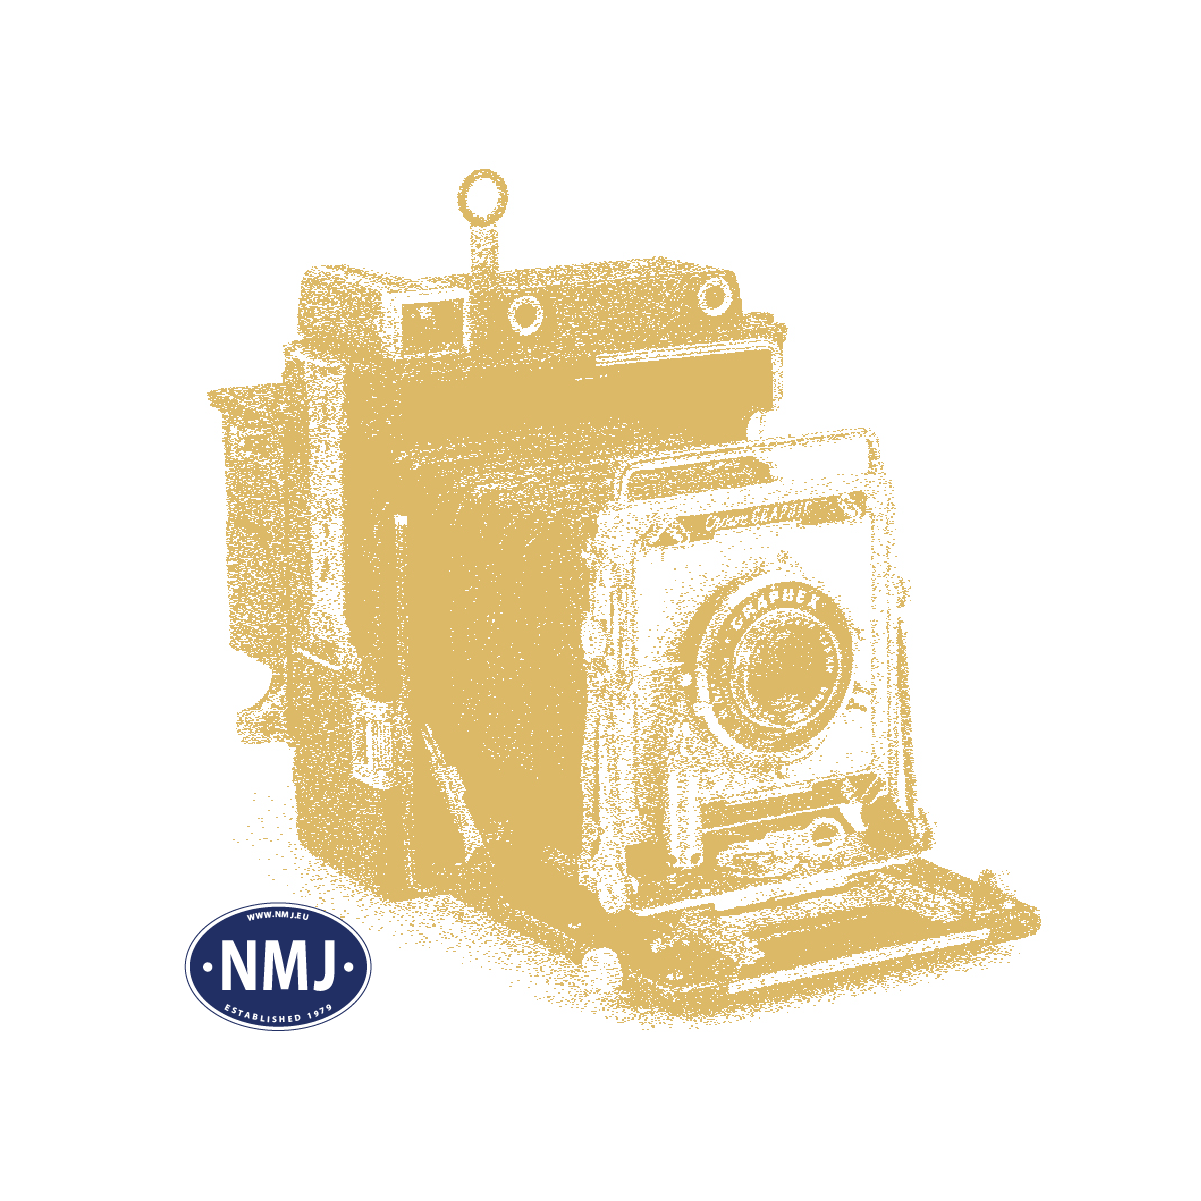 NMJSE2.1046 - NMJ Superline SJ E2.1046